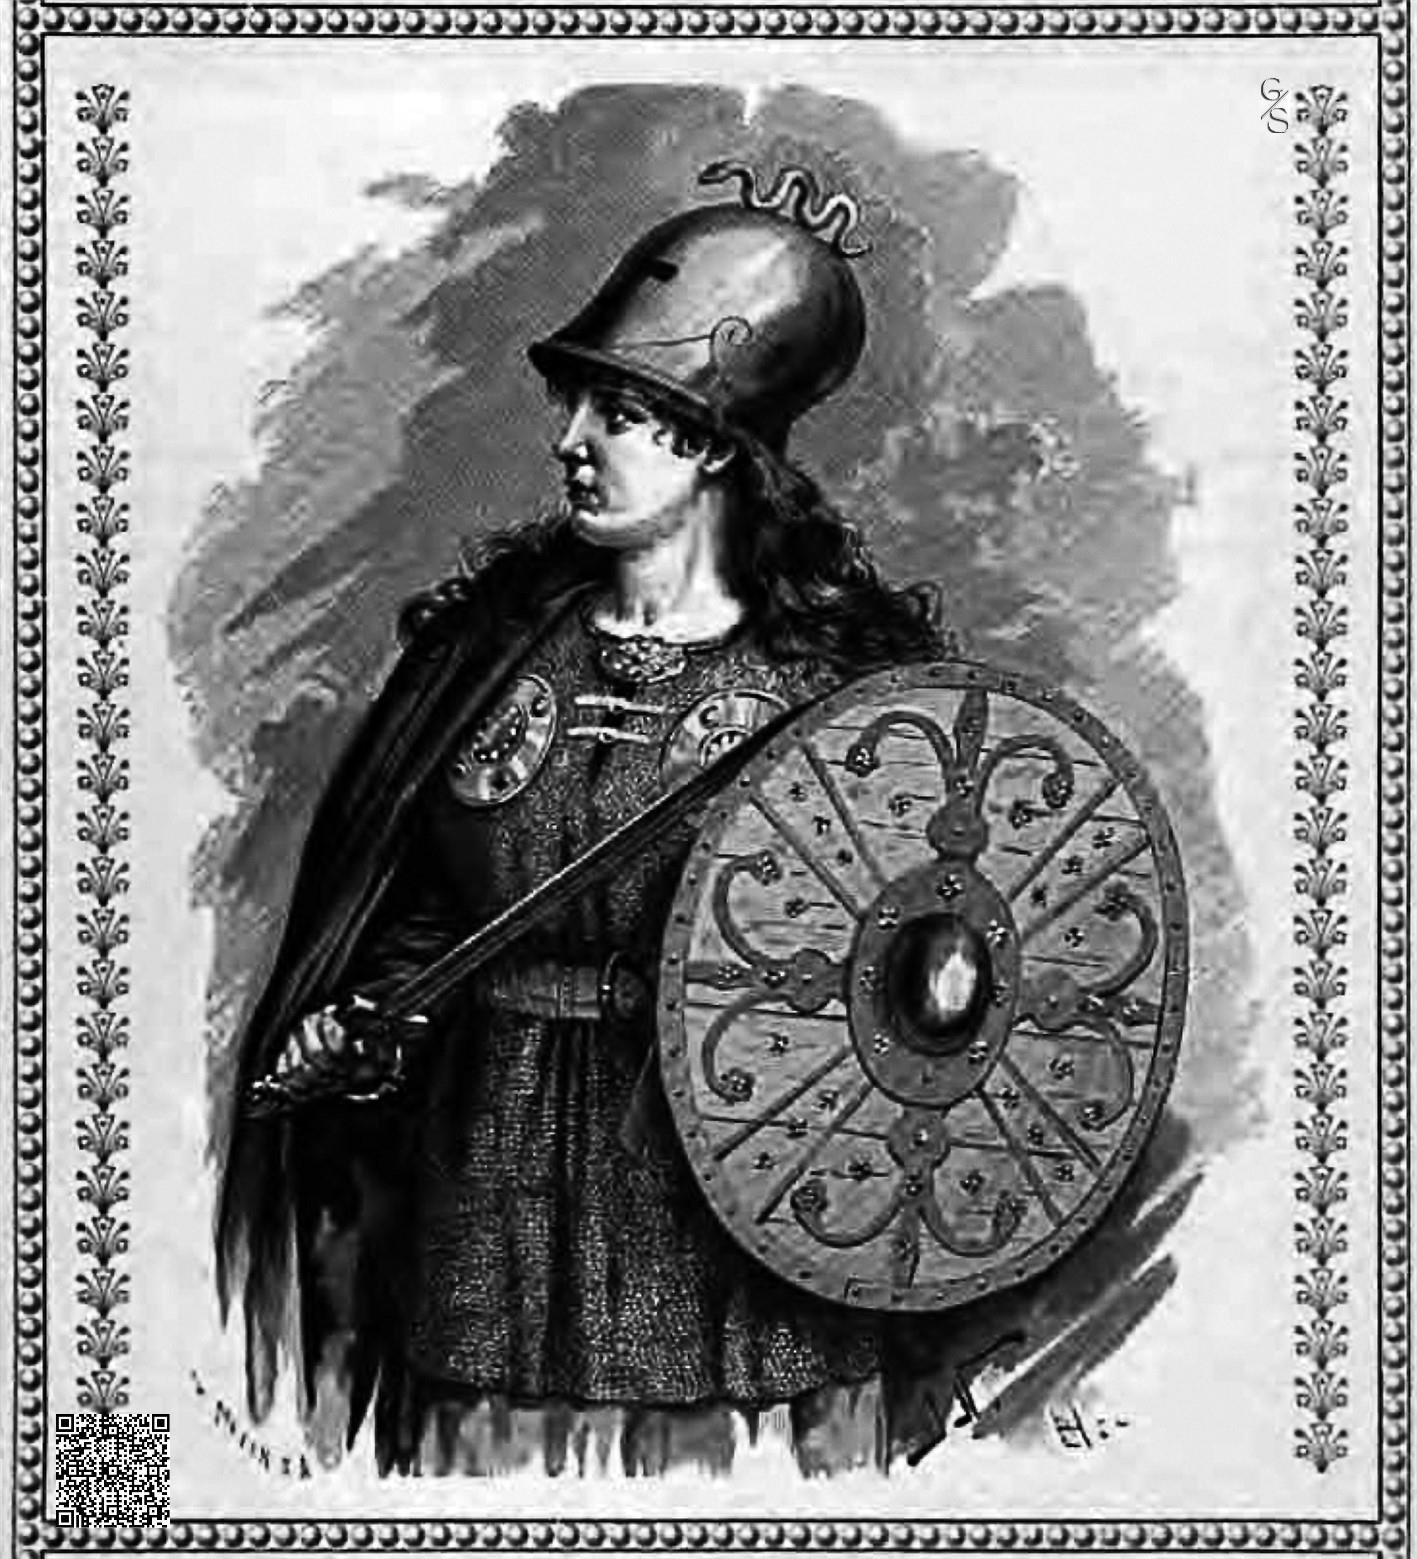 Brynhild-DE